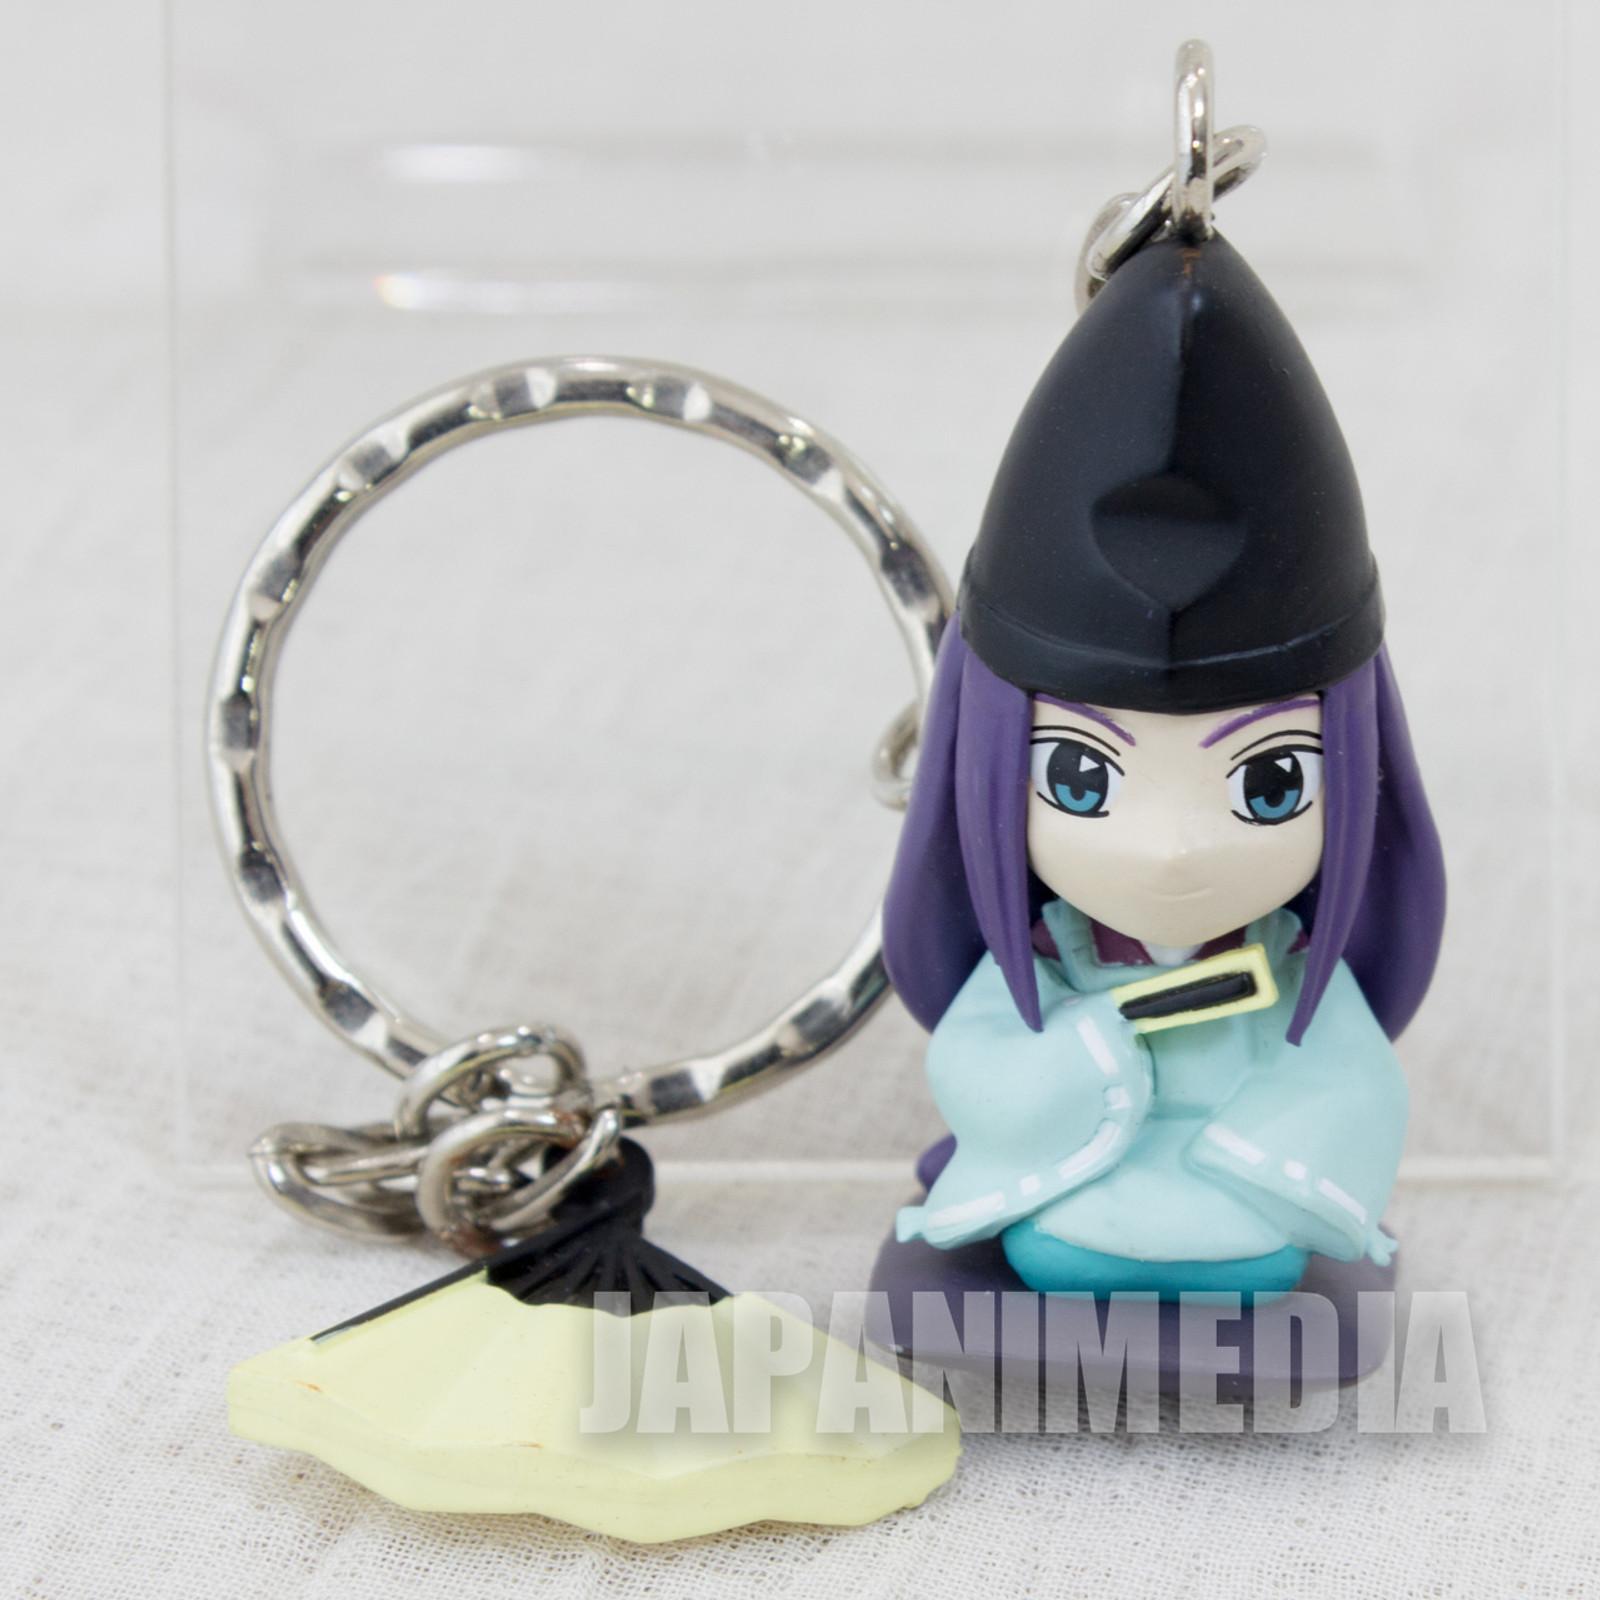 Hikaru no Go Fujiwara no Sai with Sensu Figure Key Chain JAPAN ANIME MANGA JUMP